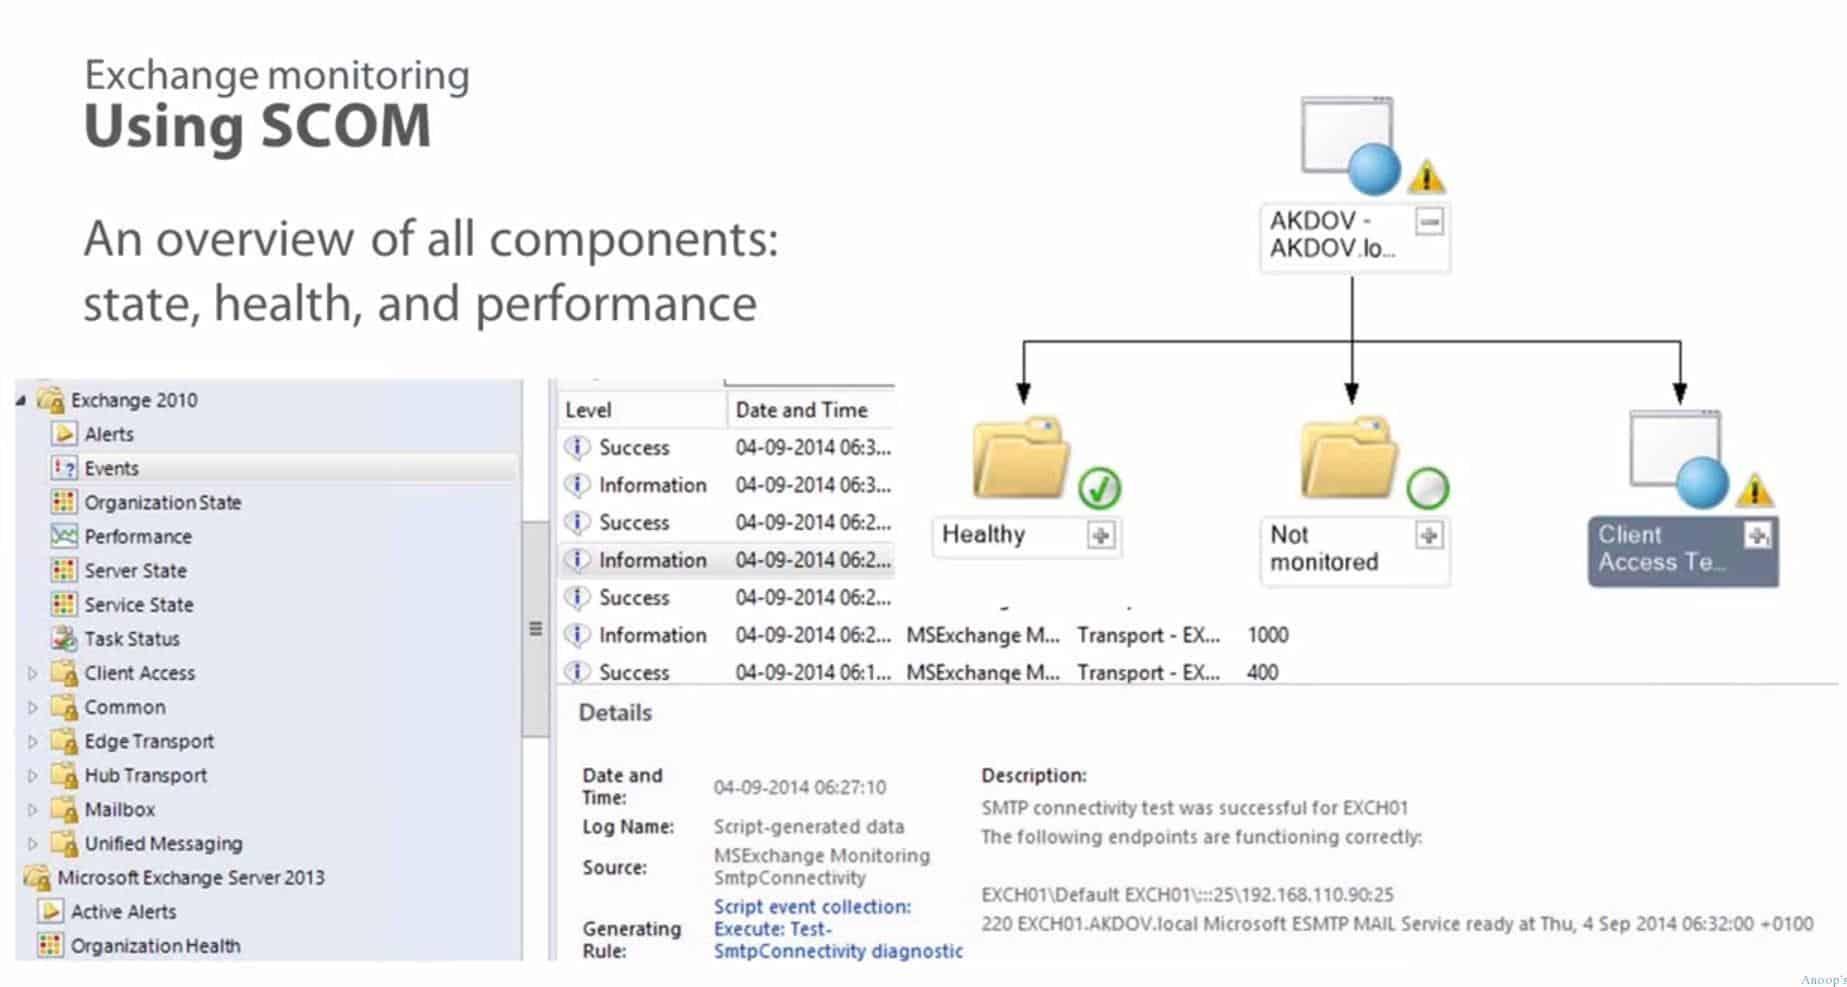 Microsoft Exchange Server 2013 Training Videos and Veeam Explorer 1